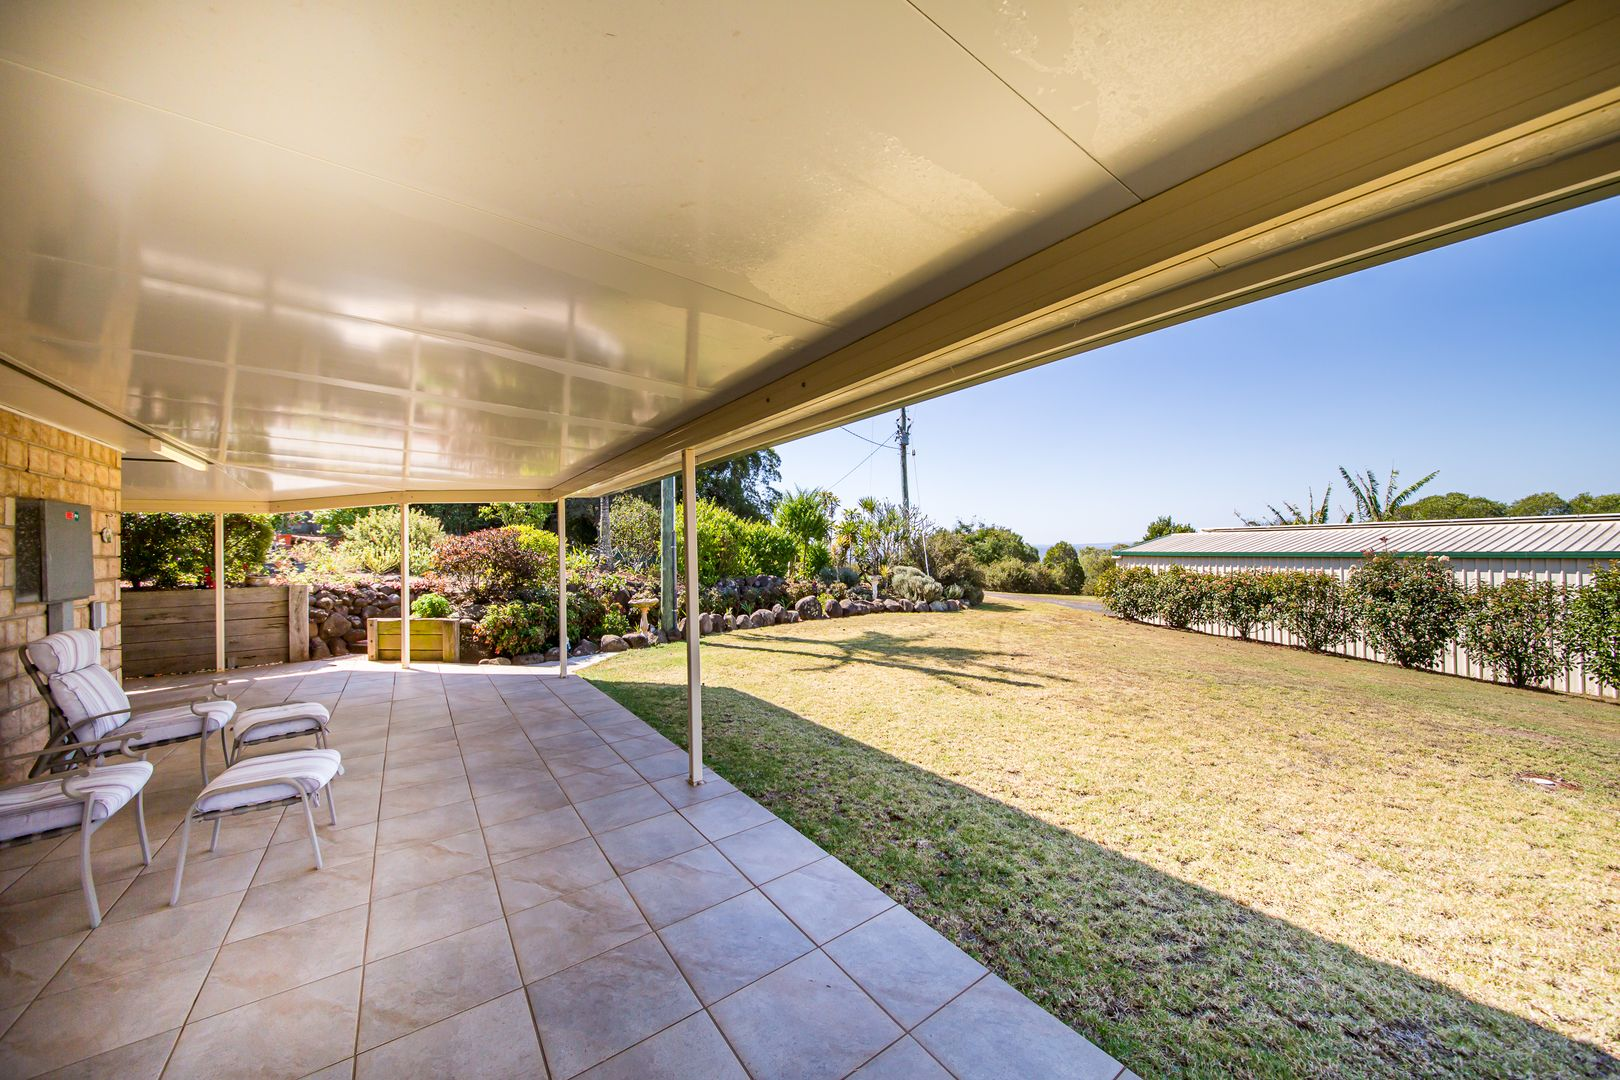 637 Kry Barkers Creek Road, Kingaroy QLD 4610, Image 2